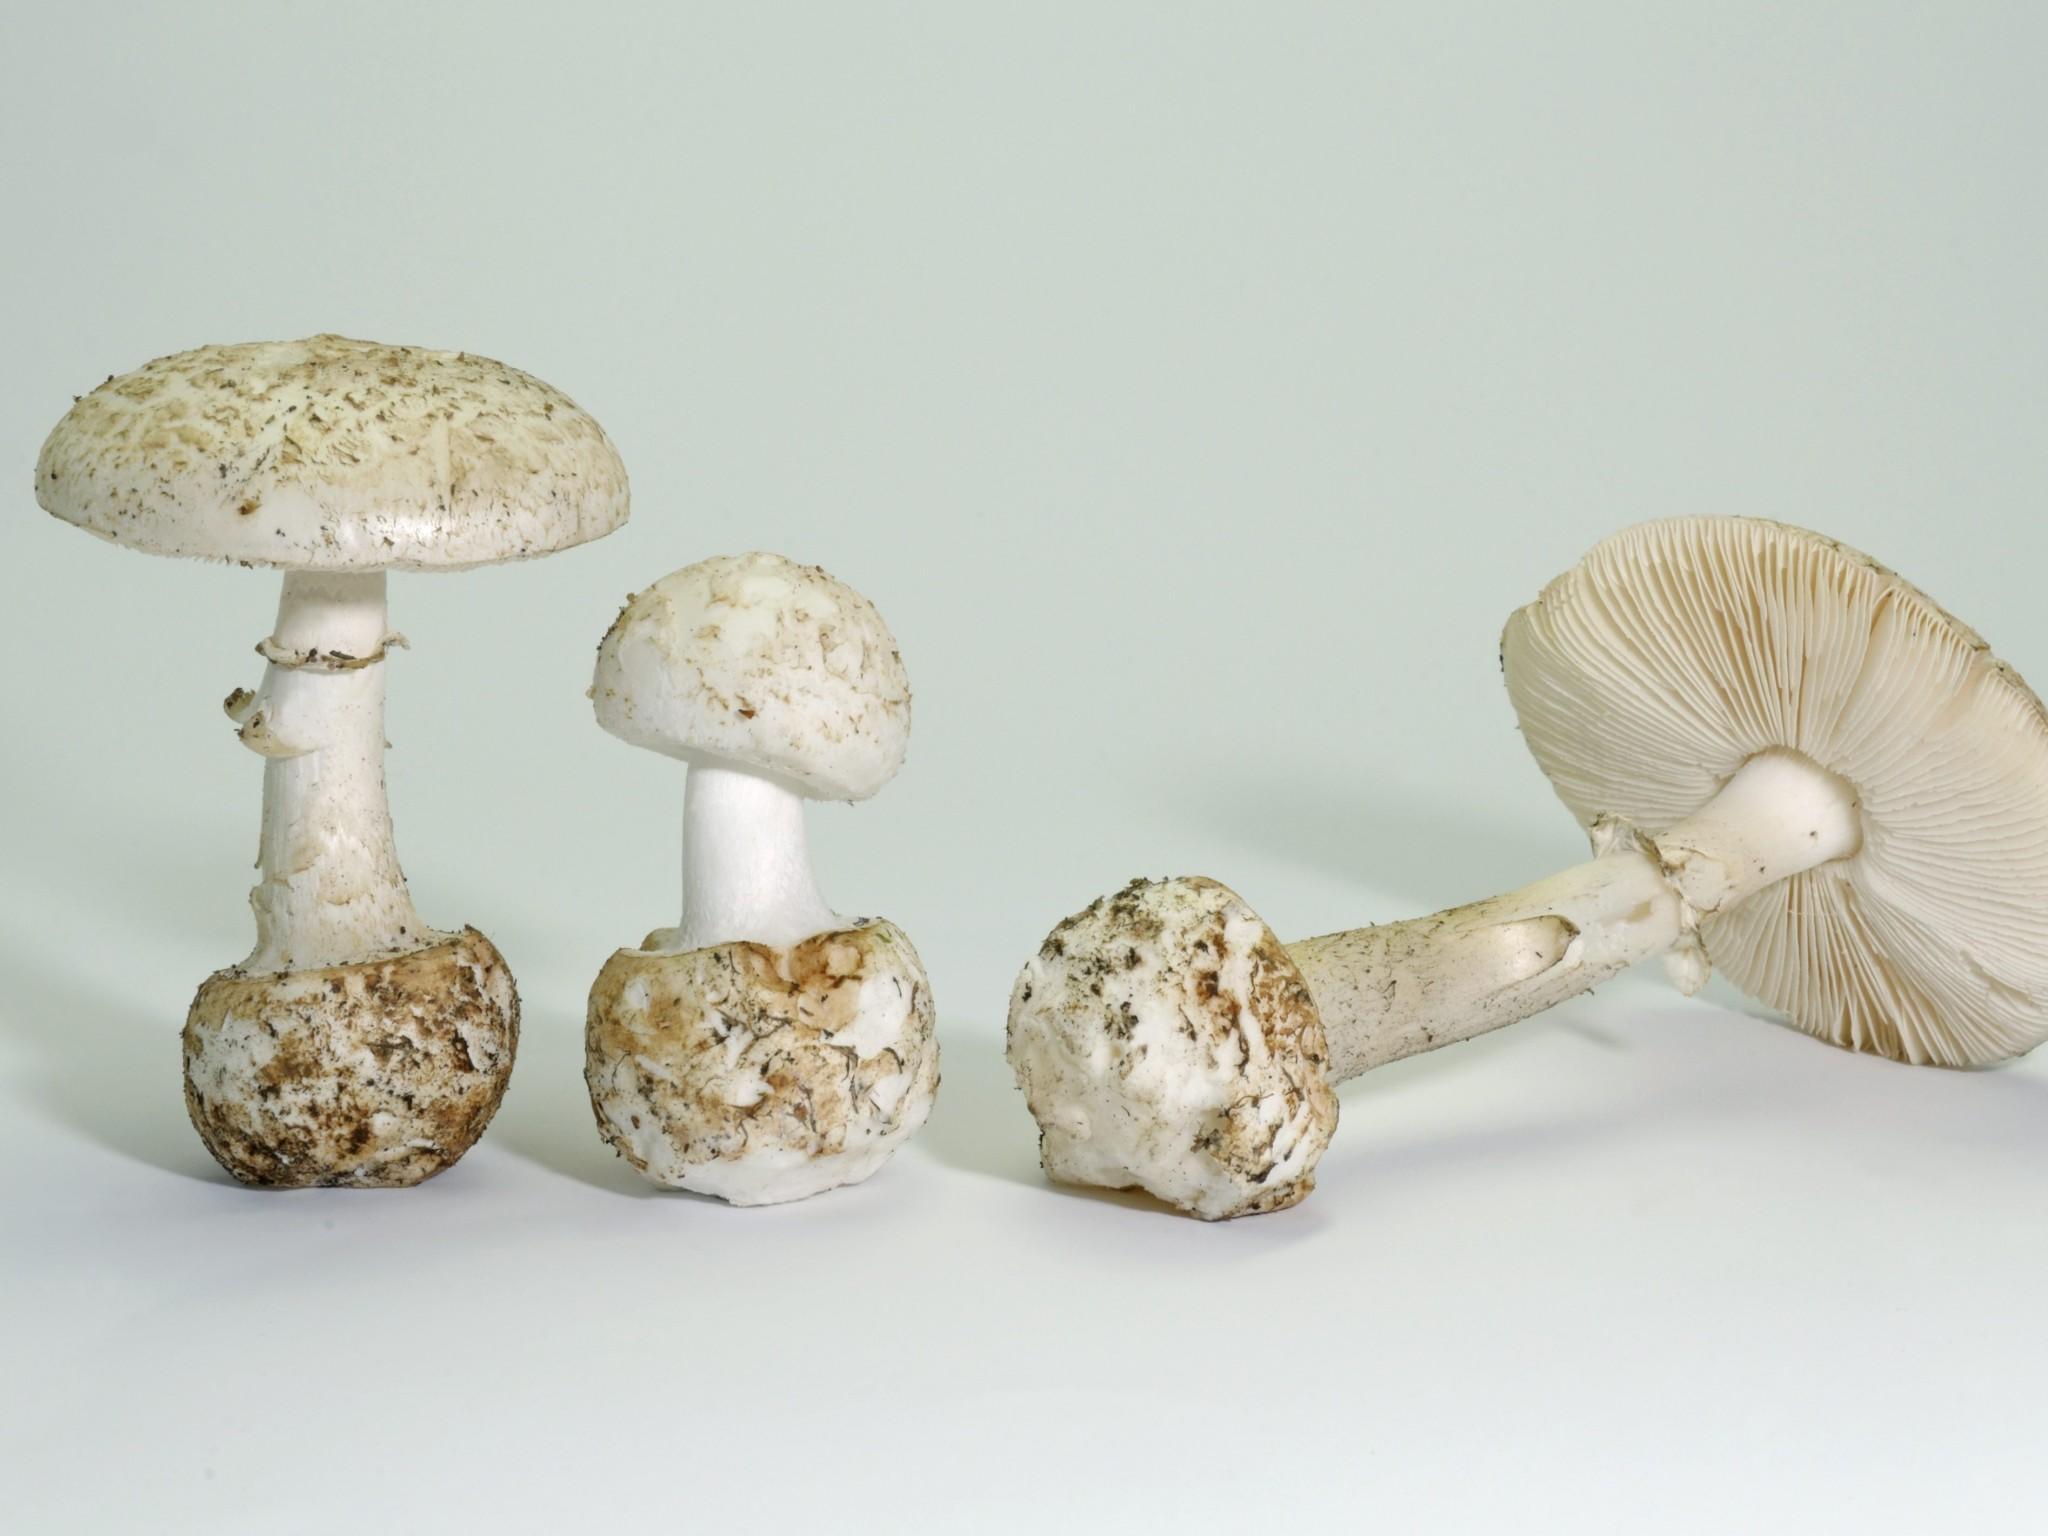 Pilze und Doppelgänger